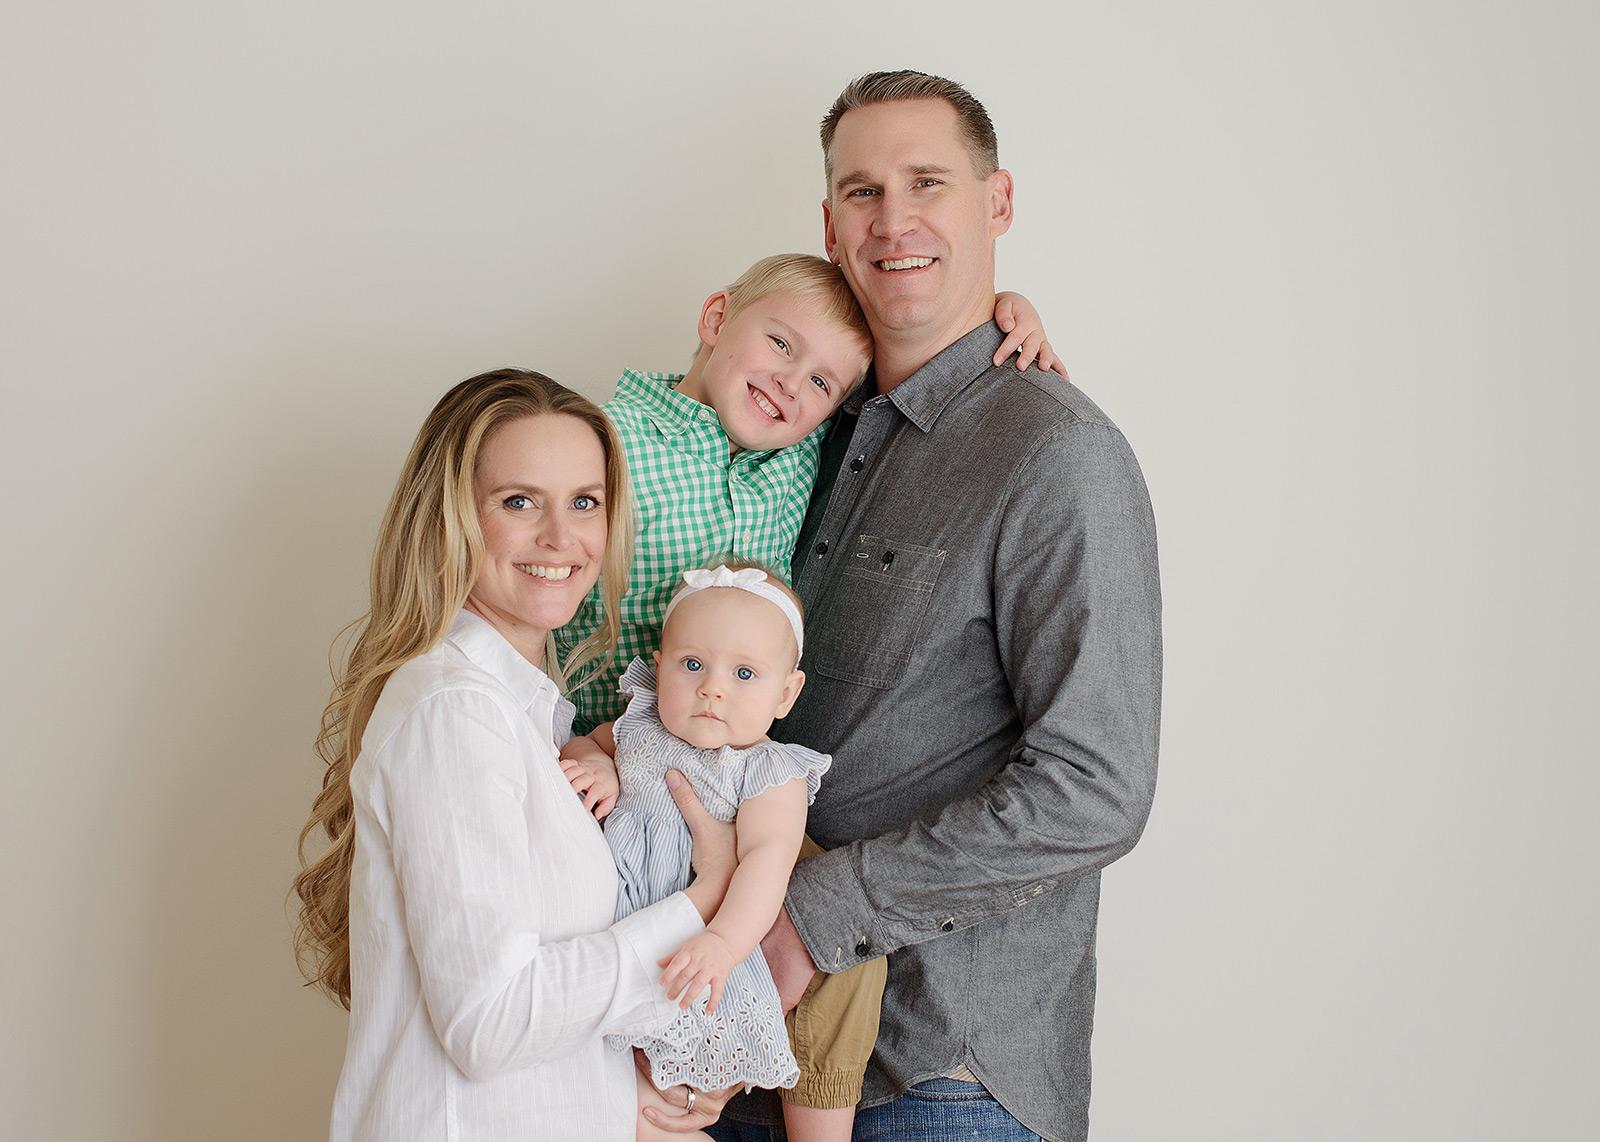 Sacramento Family Portrait on White Background in Studio